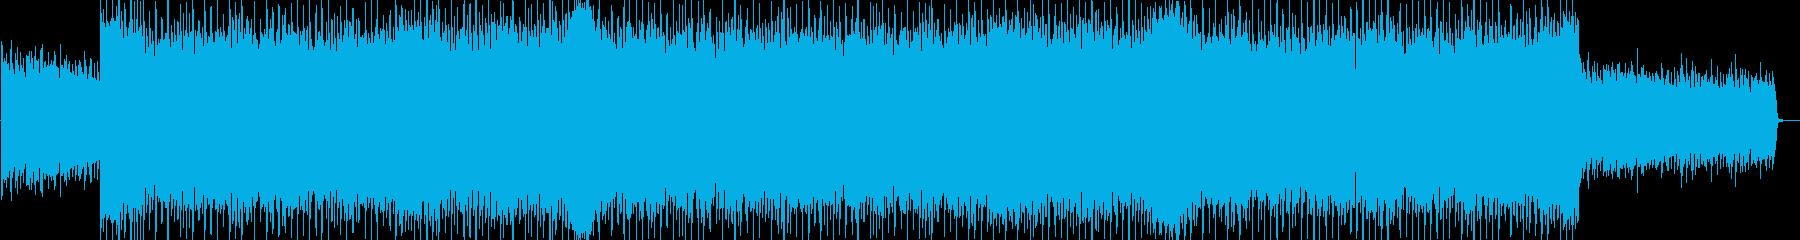 Moveの再生済みの波形